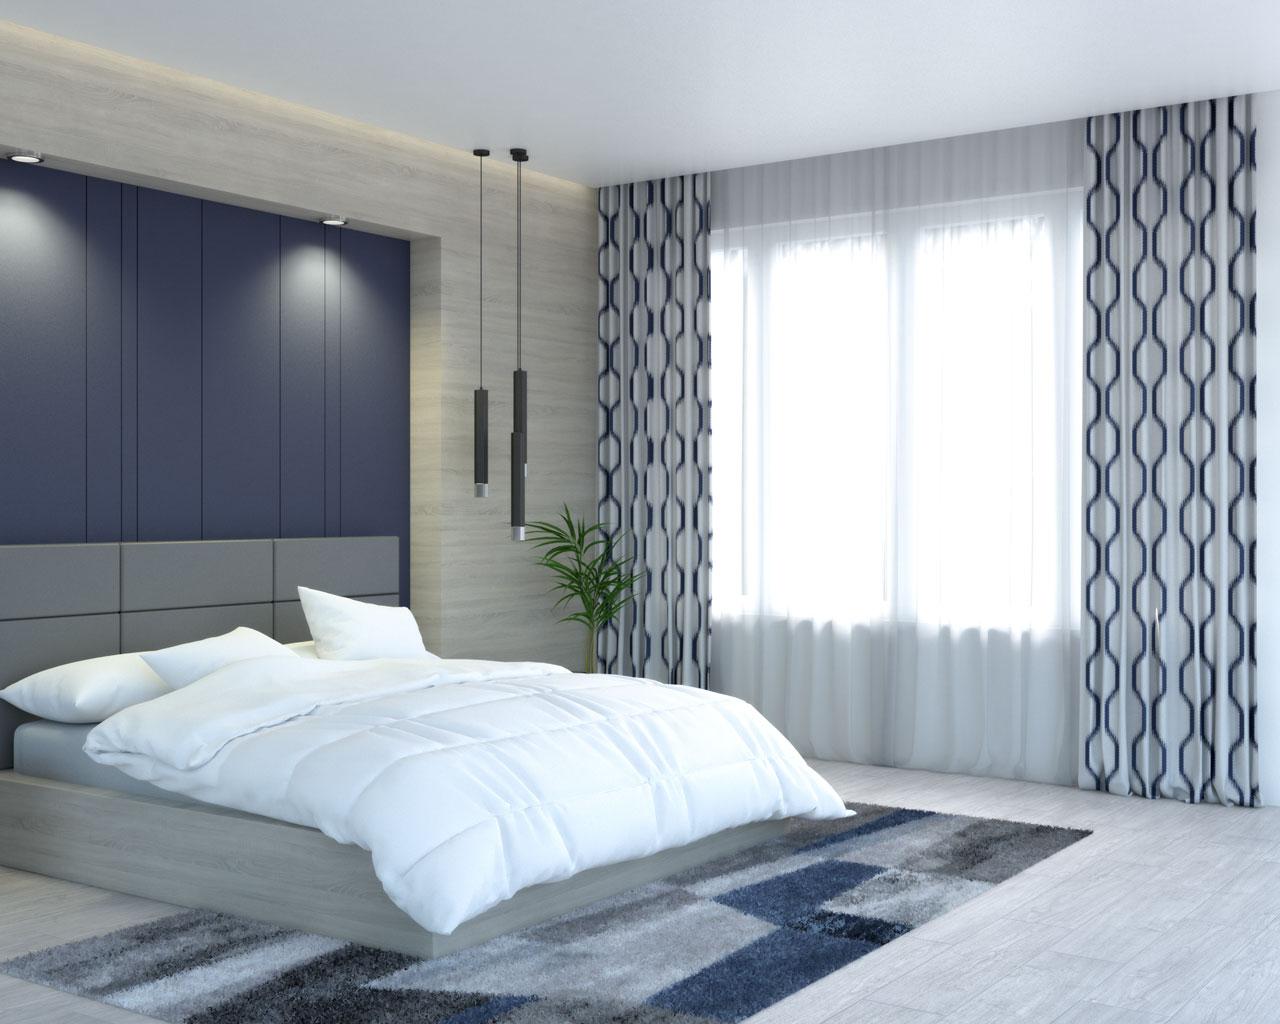 White and blue ikat geometric print curtains